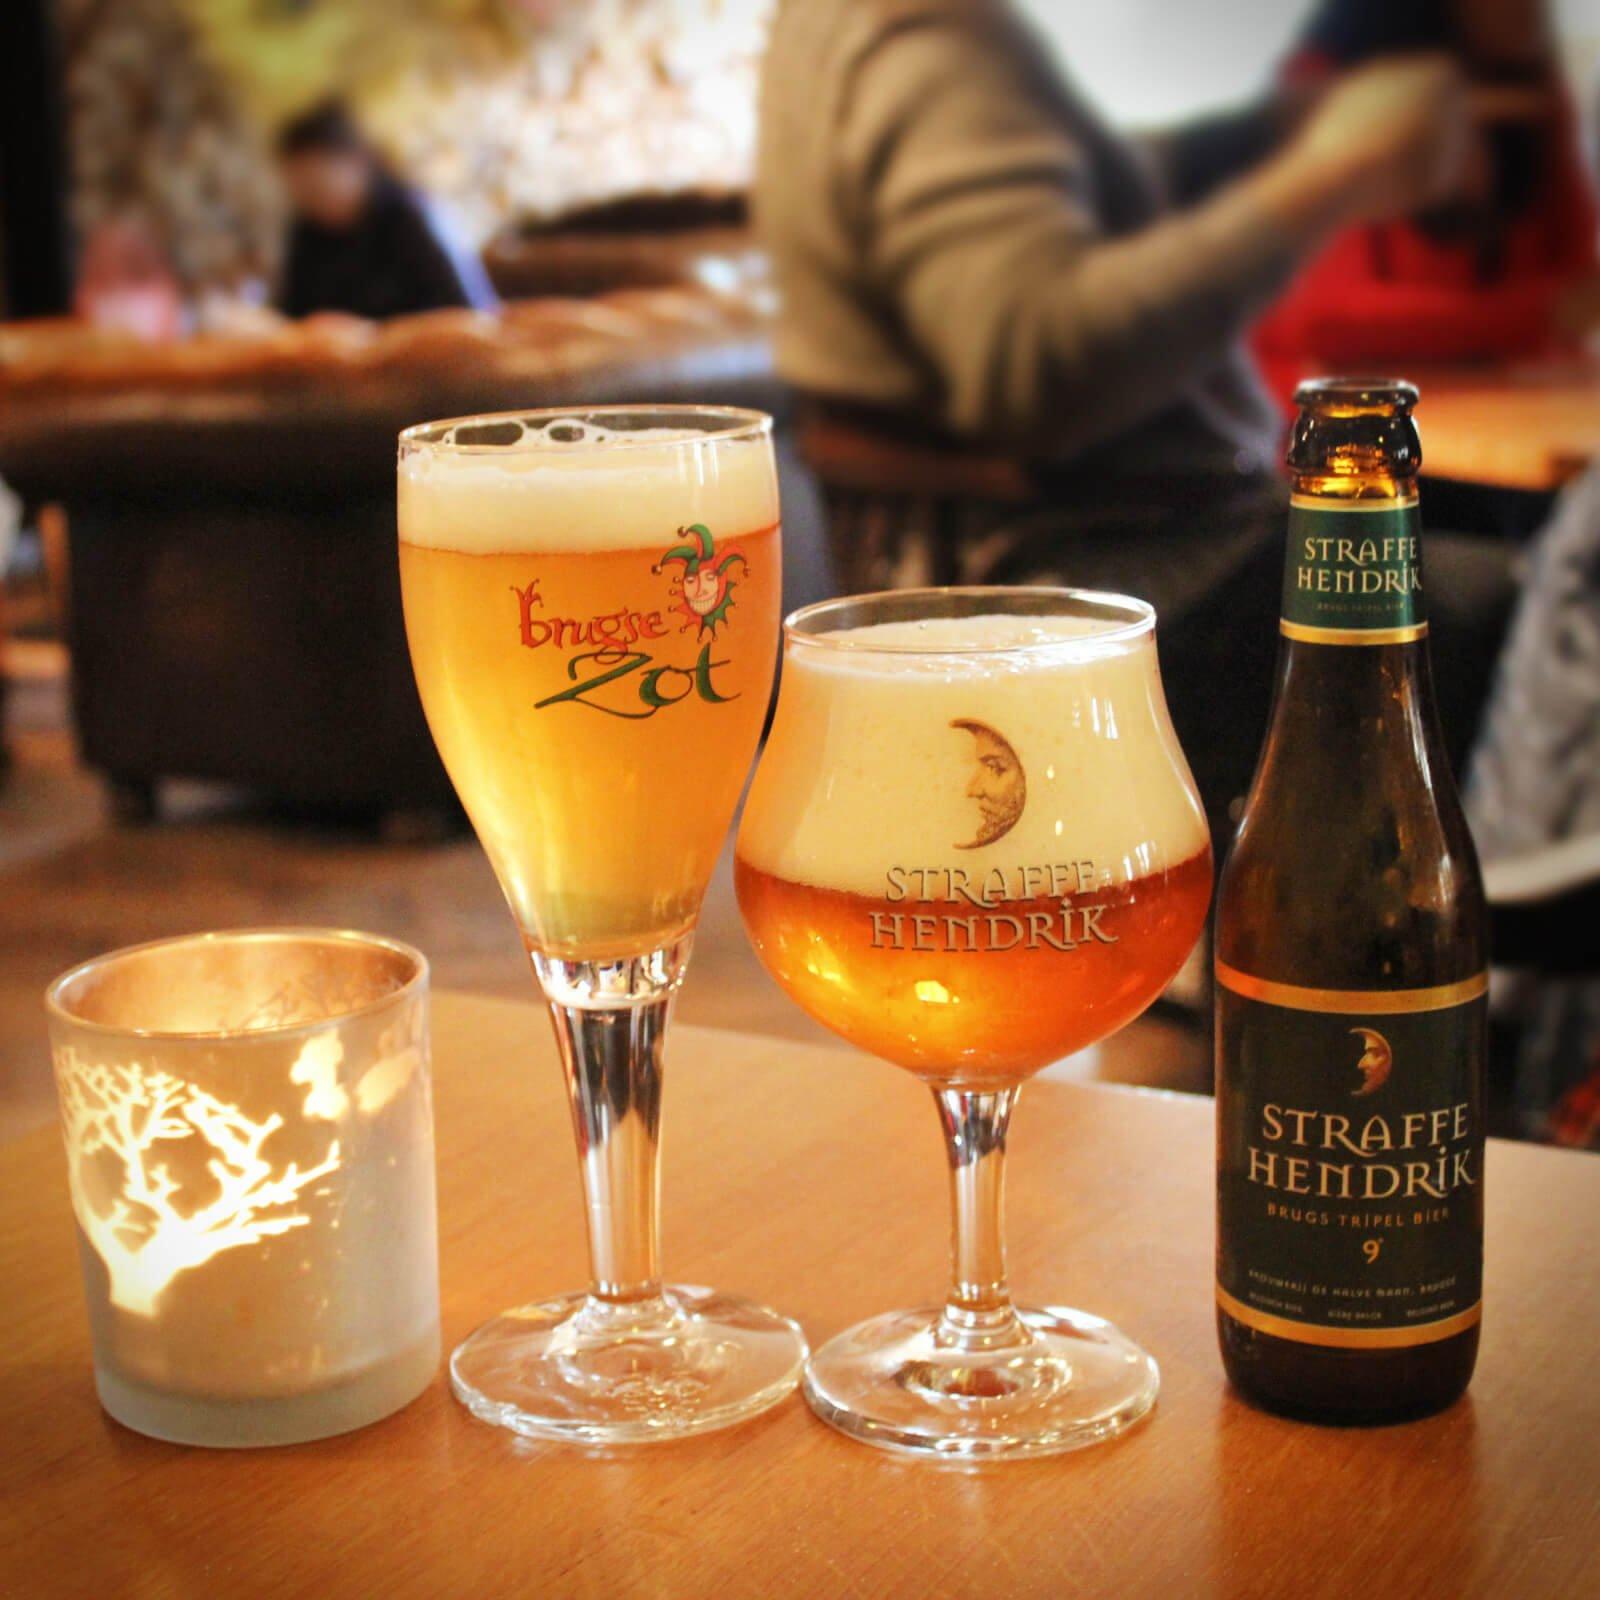 Two Belgian beers at Halve Man Brewery, in romantic Brugges, Belgium.